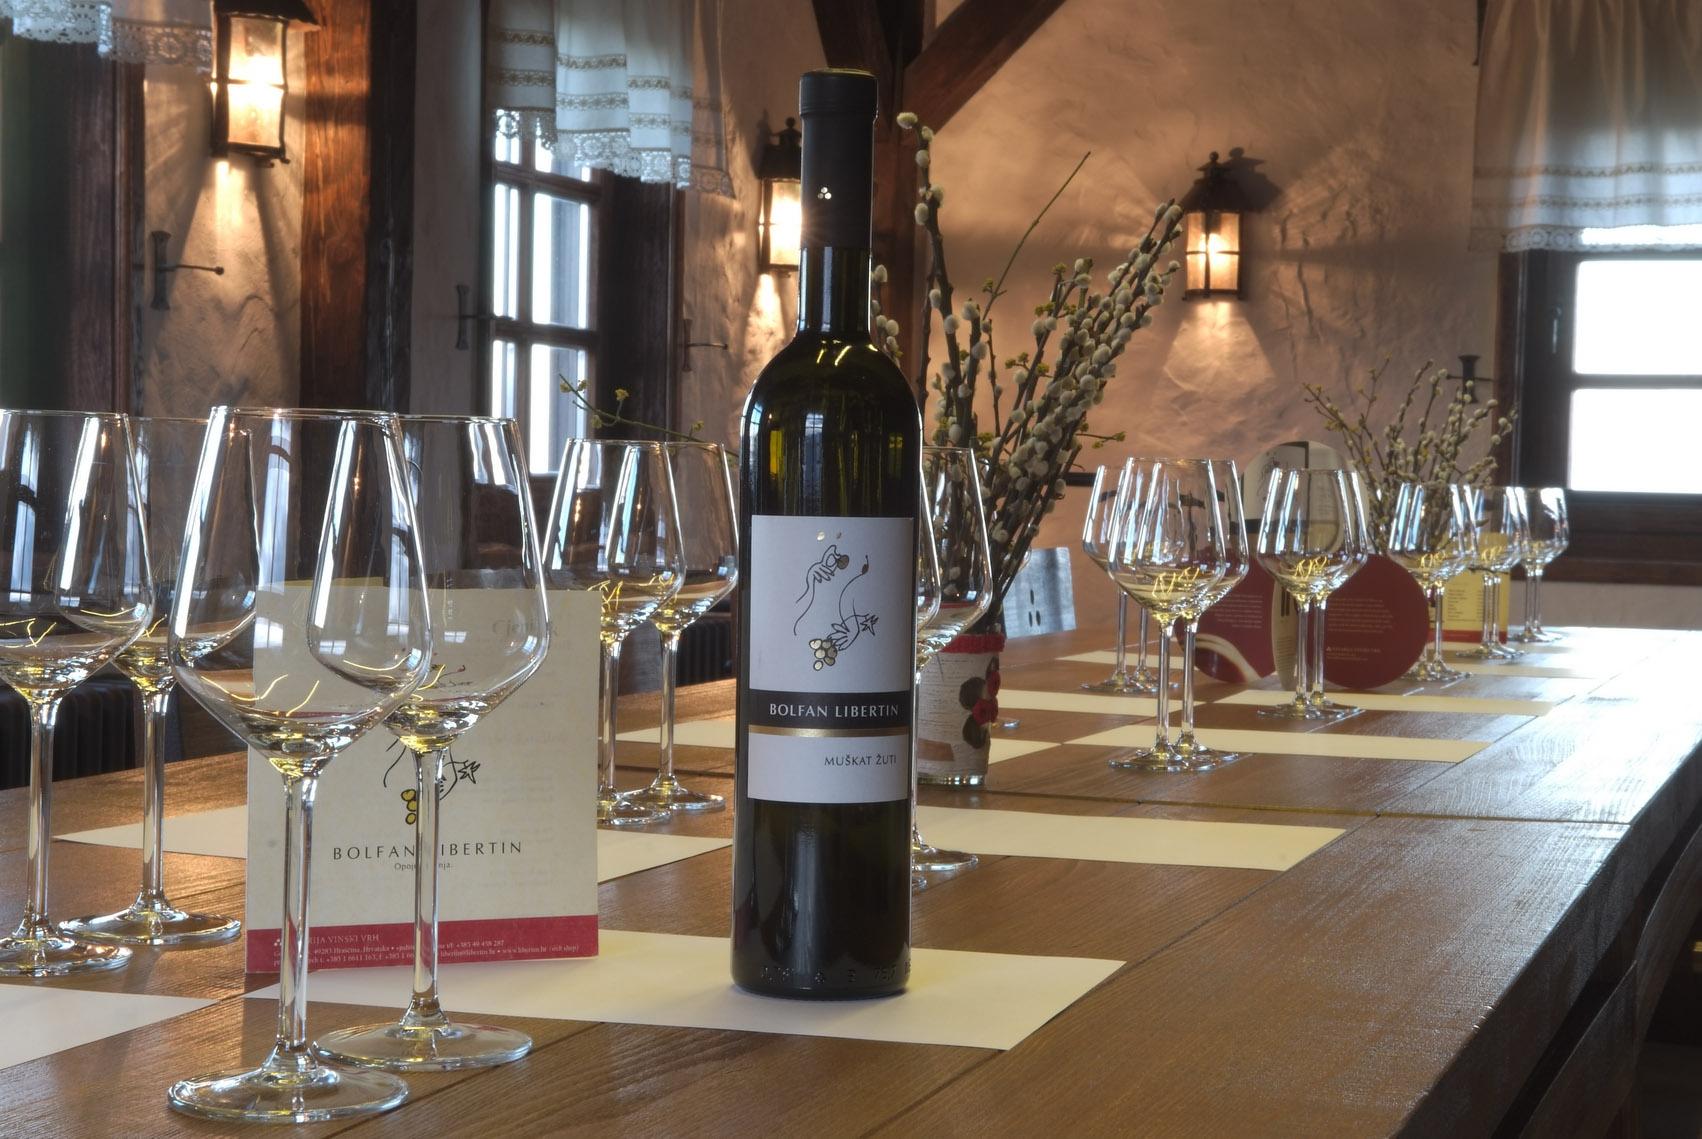 Vinski vrh, 140510. Vina vinarije Tomislava Bolfana. Foto: privatna arhiva